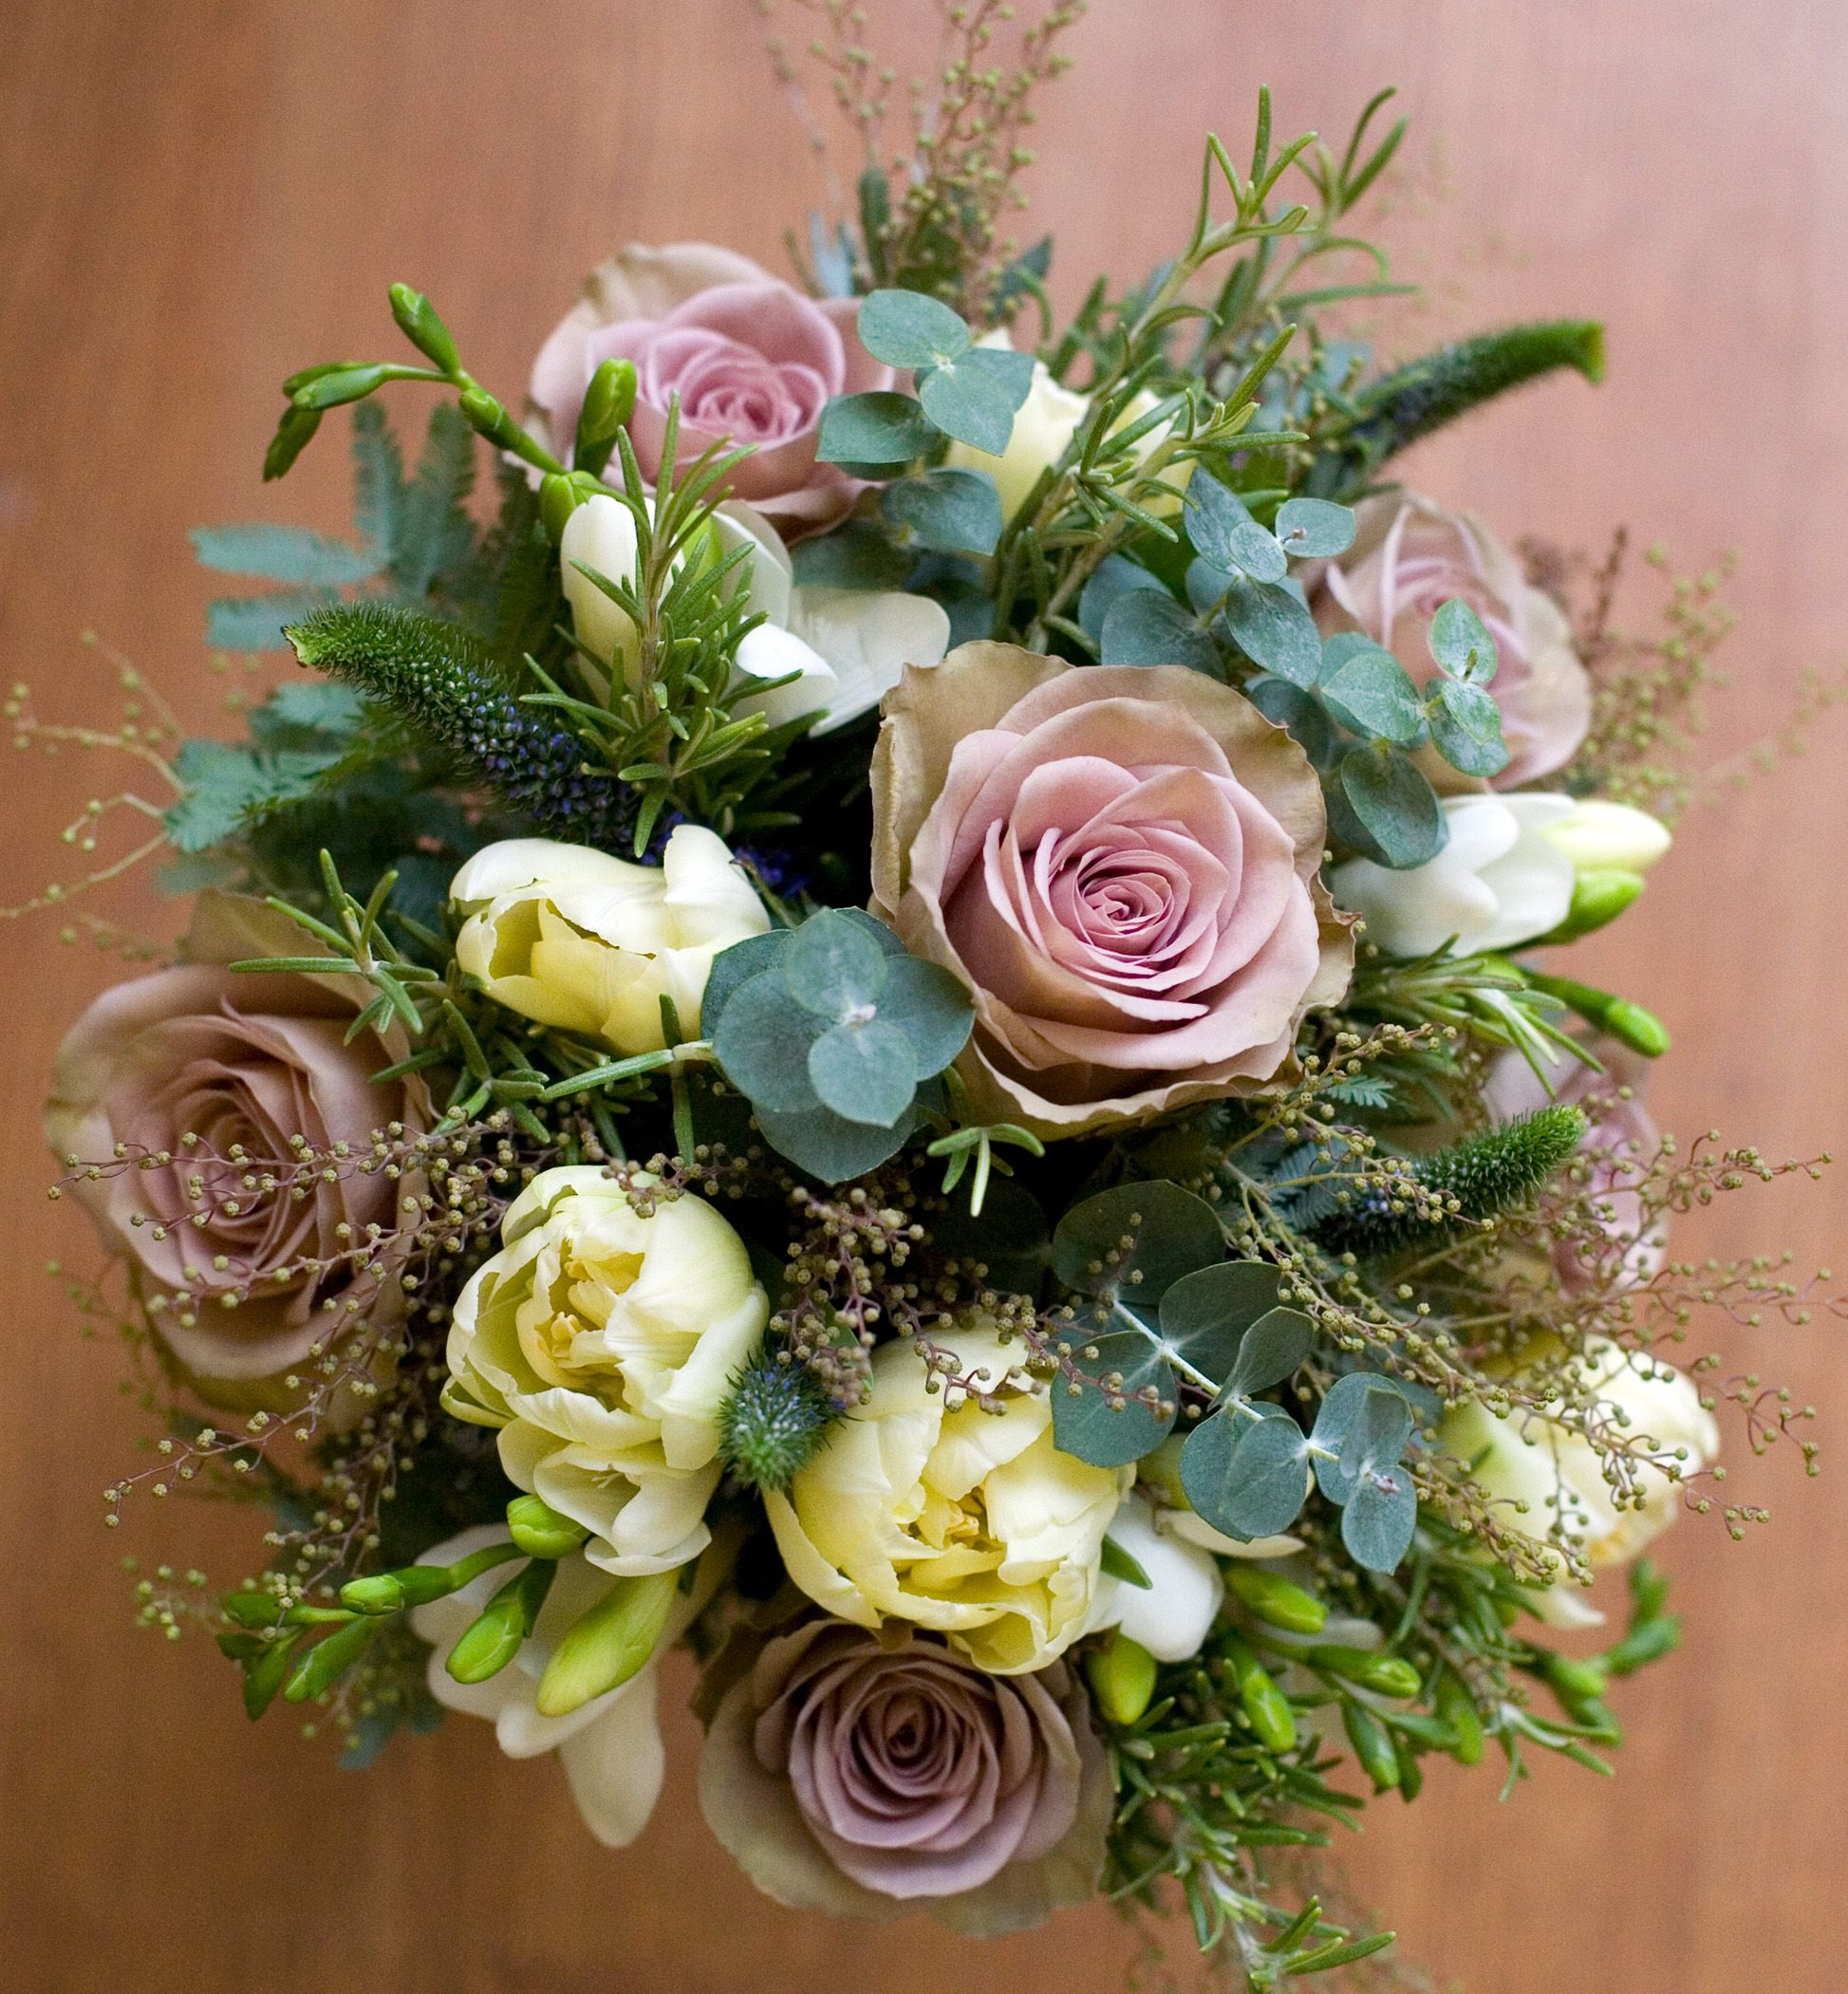 Wedding Hand Bouquet Flower: Vanillarose.co.uk Hand Tied Bridal Bouquet With Amnesia